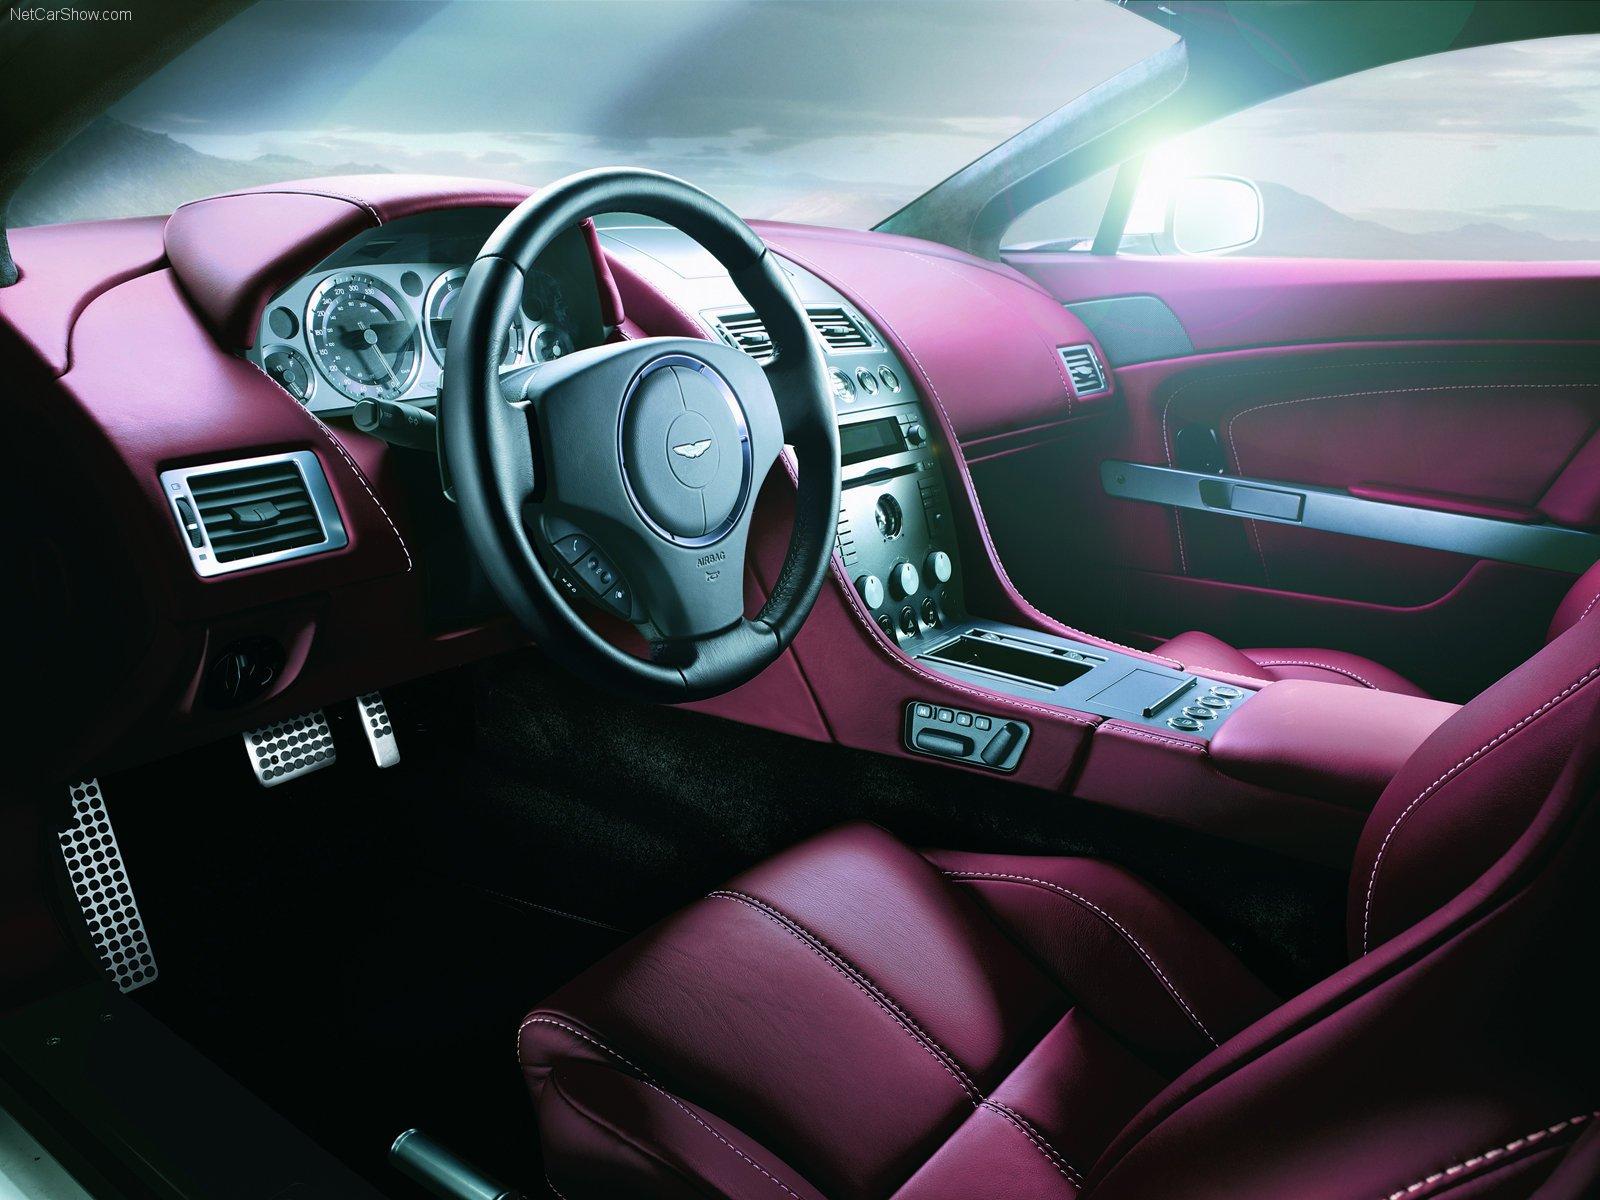 Véhicules - Aston Martin V8 Vantage  Aston Db9 Aston Martin Fond d'écran